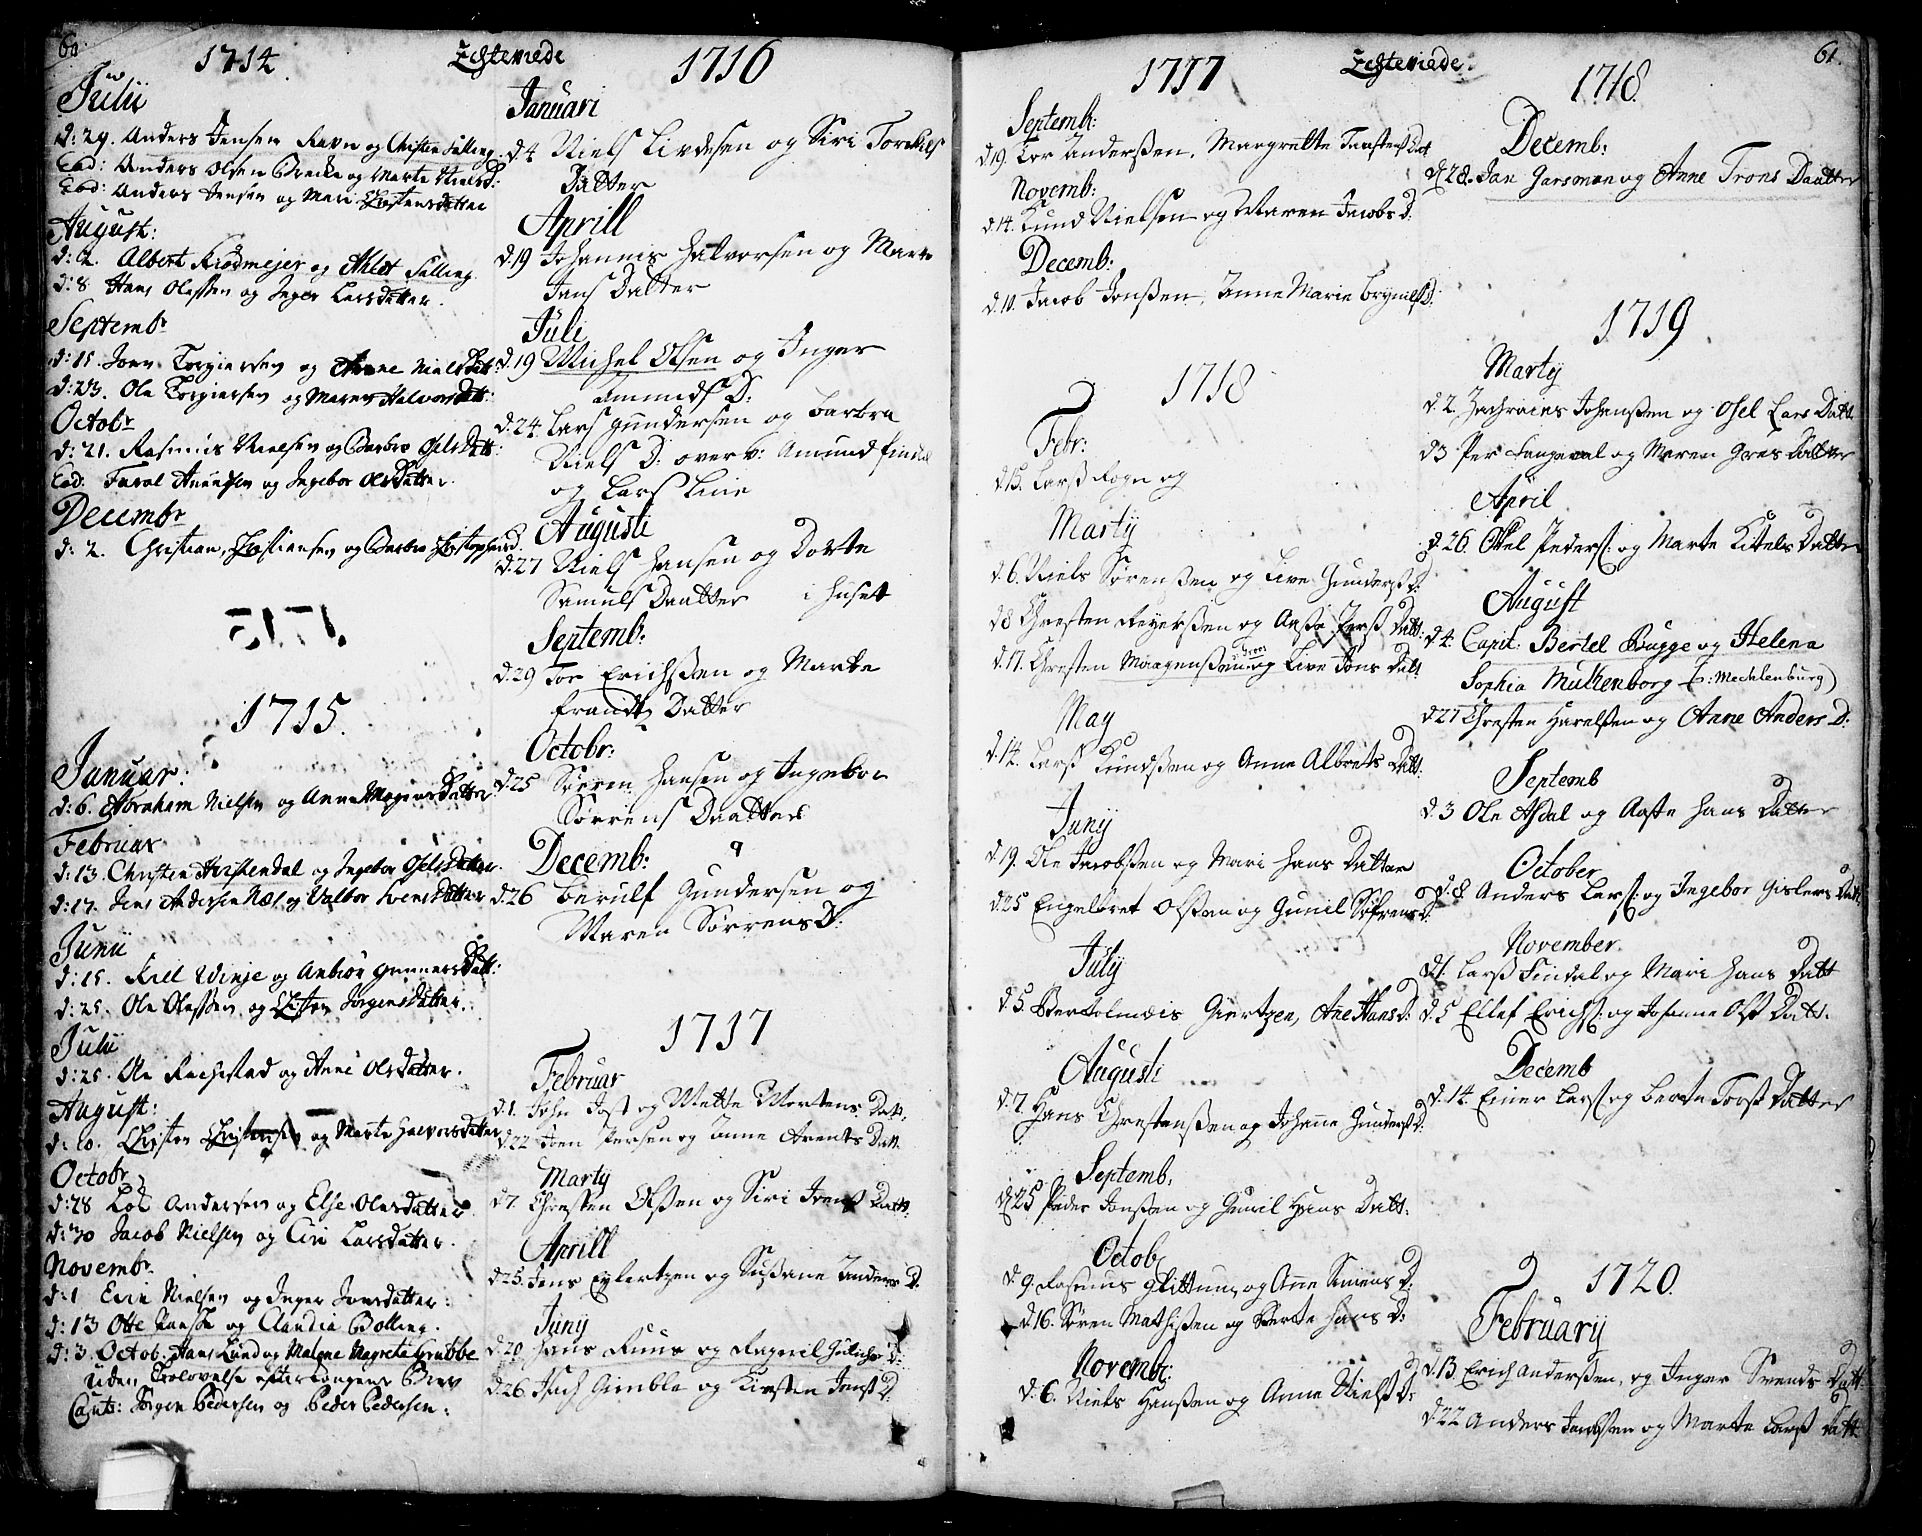 SAKO, Bamble kirkebøker, F/Fa/L0001: Ministerialbok nr. I 1, 1702-1774, s. 60-61